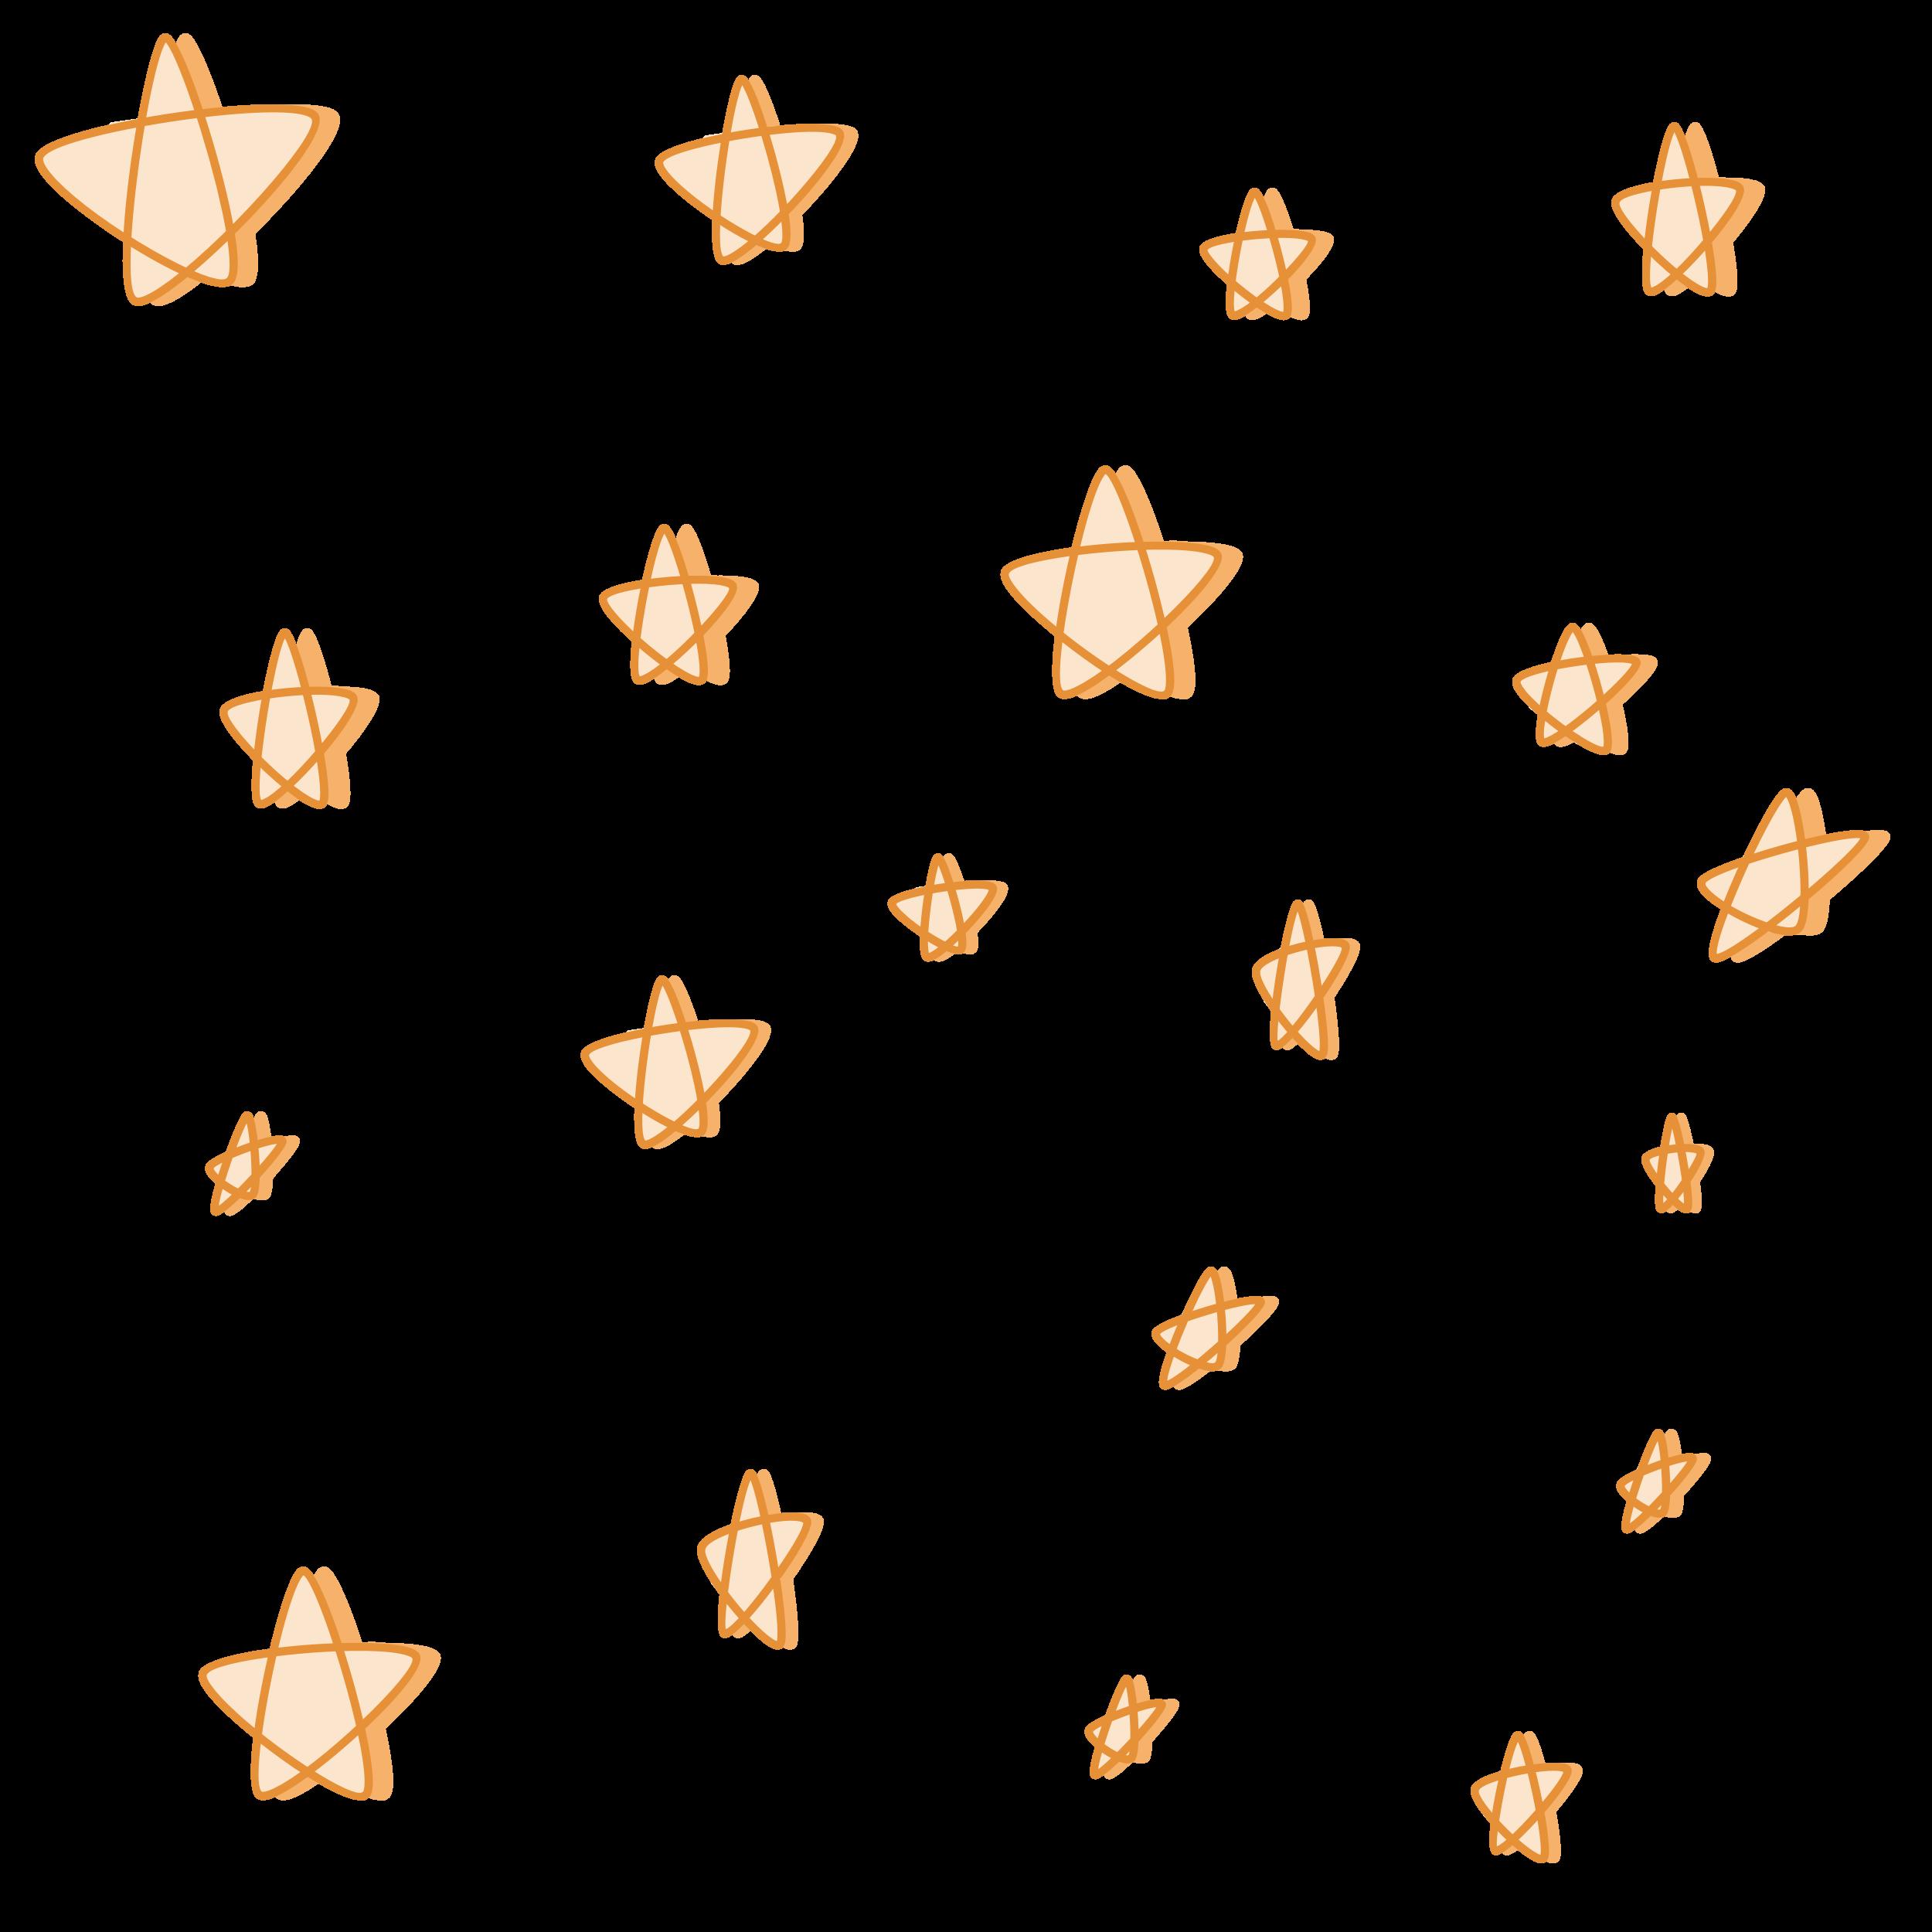 Orange Pastel Stars With Shadow Sticker By Arexus Aesthetic Stickers Orange Aesthetic Pastel